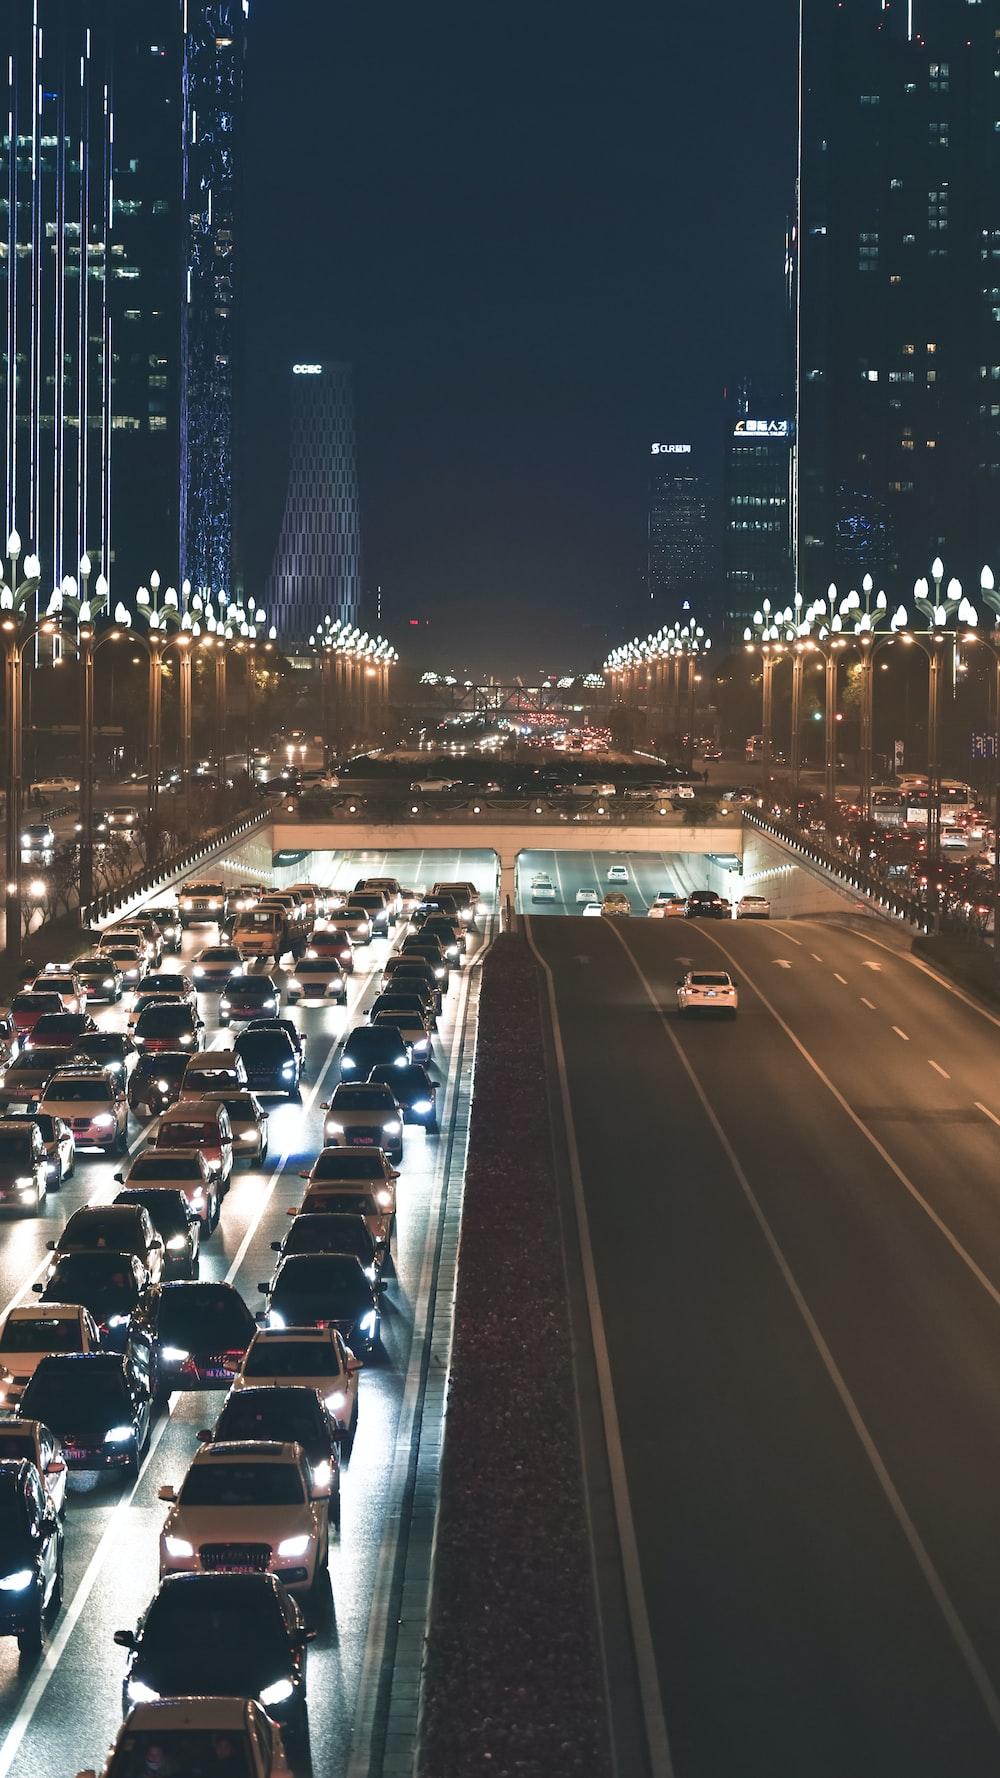 idle cars on street on nighttime